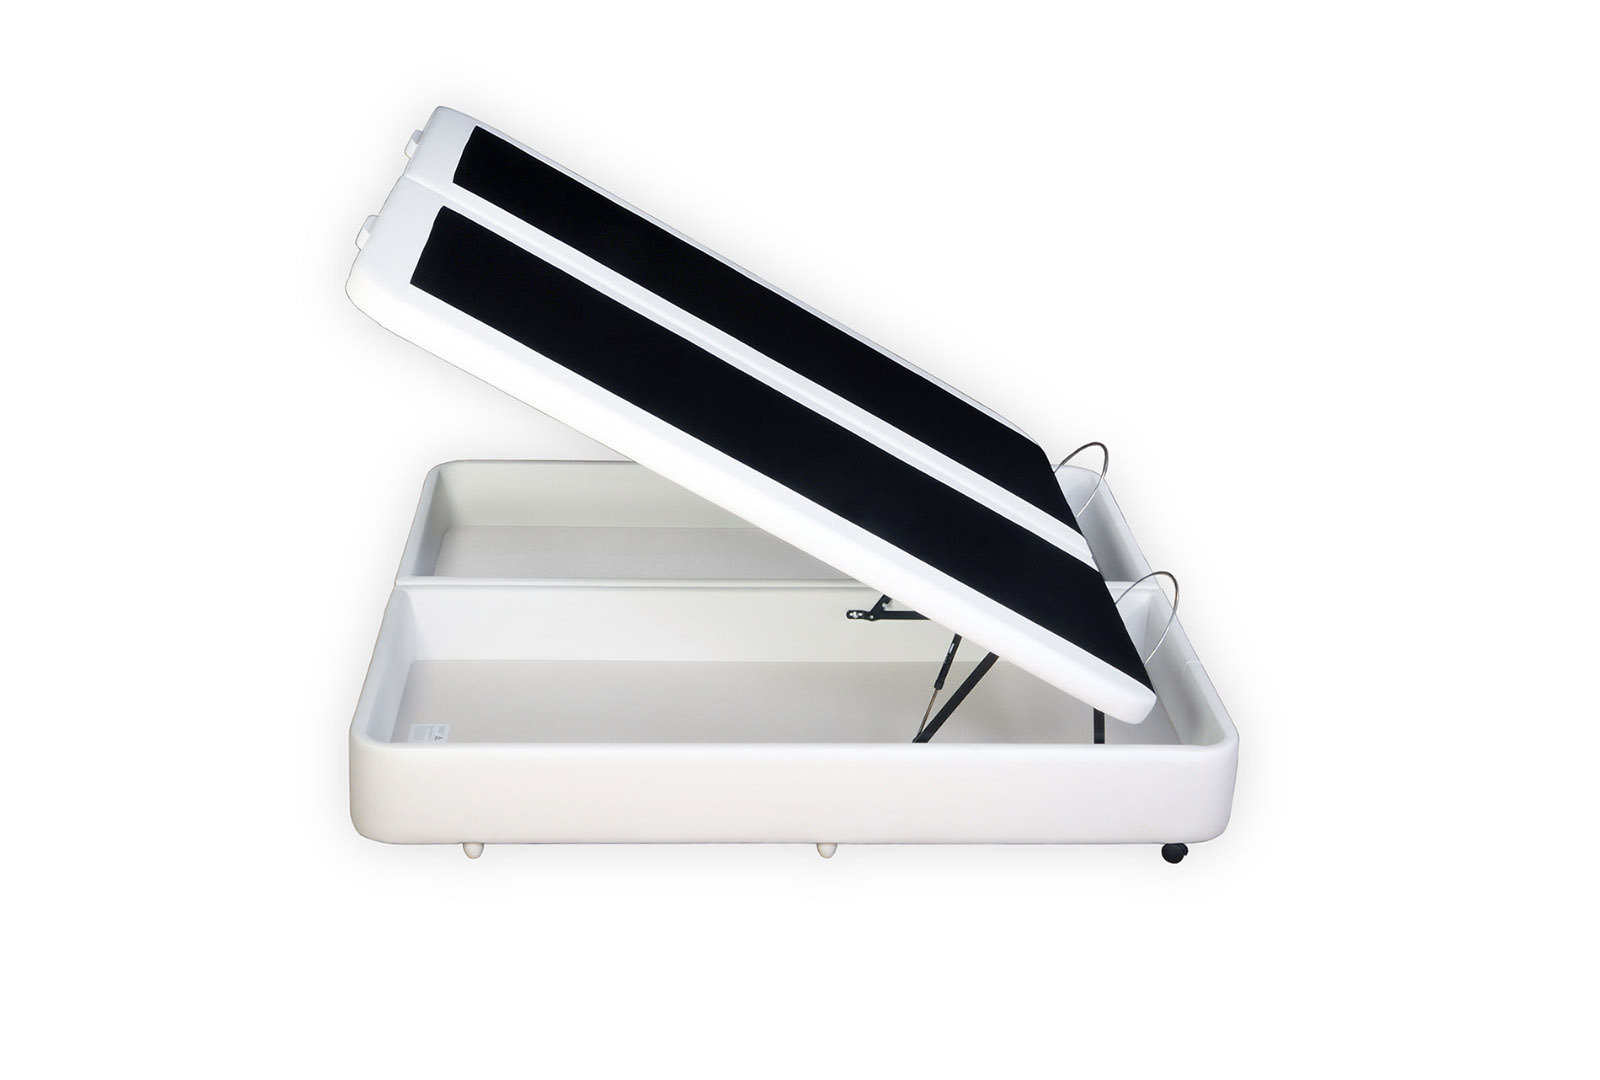 canape ares plus gemelar 200 x 220 cm 100 100 latiendadecolchones com. Black Bedroom Furniture Sets. Home Design Ideas